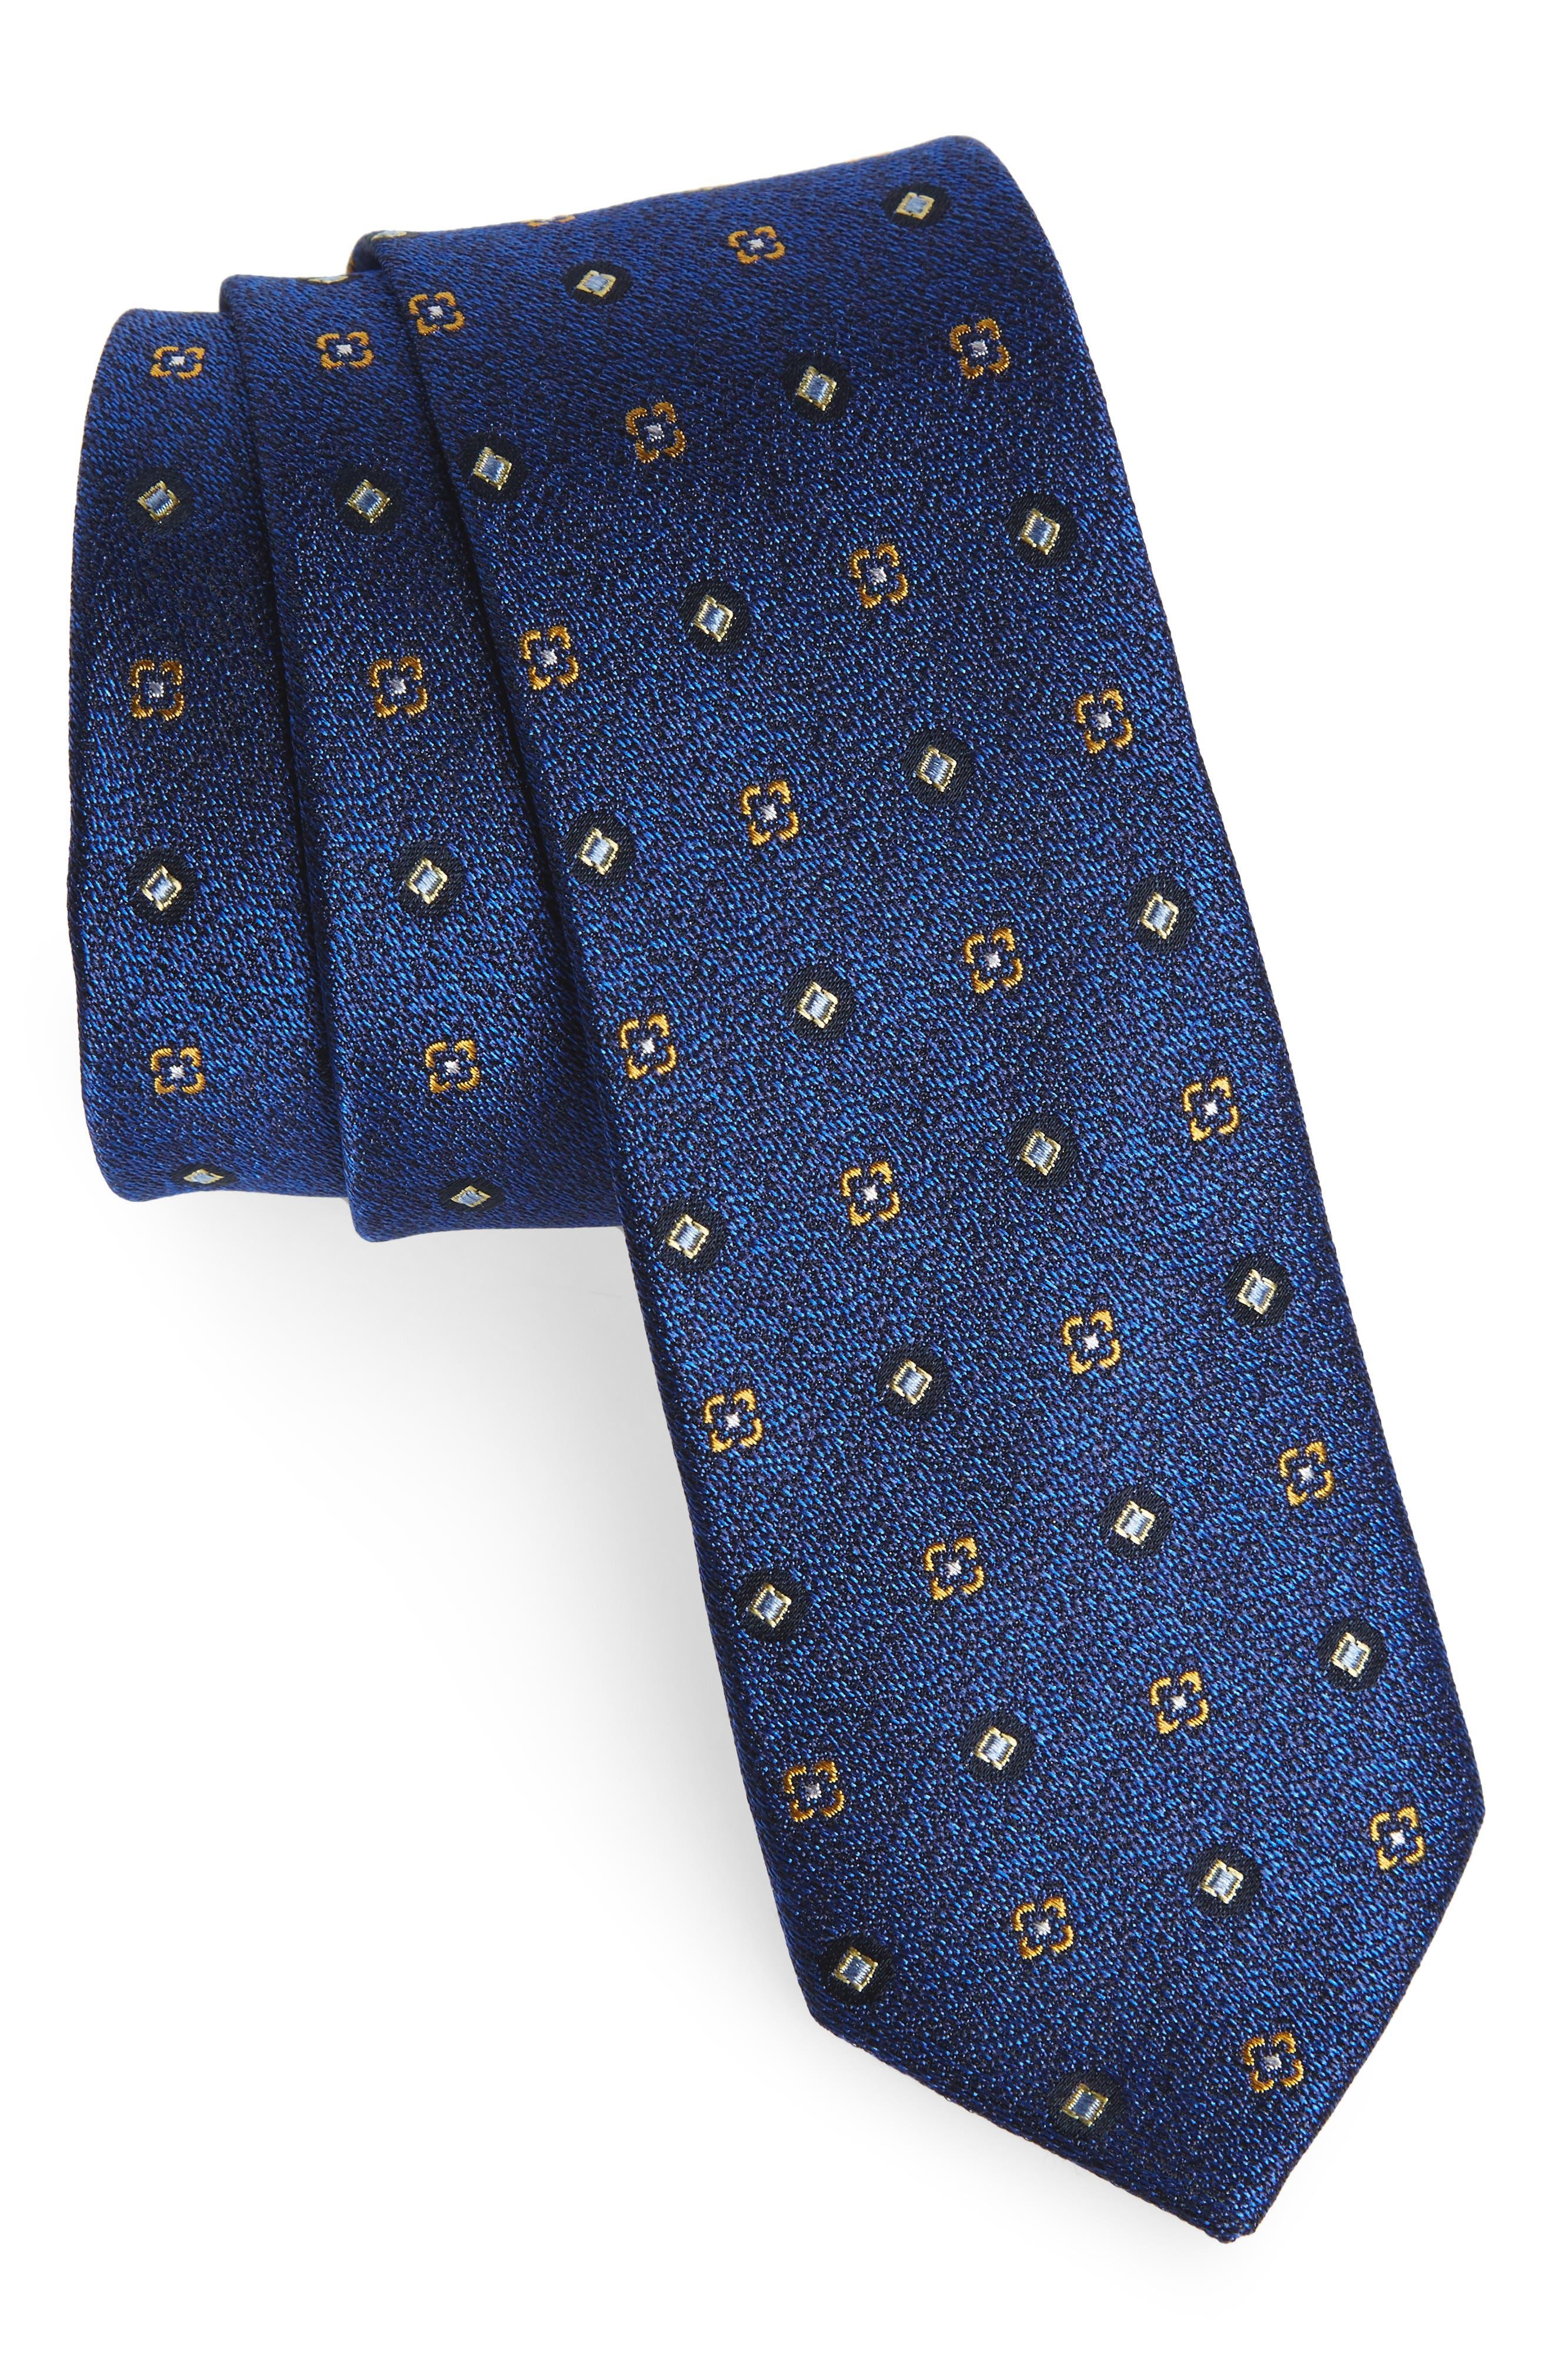 Alternate Image 1 Selected - Michael Kors Neat Medallion Silk Tie (Big Boys)